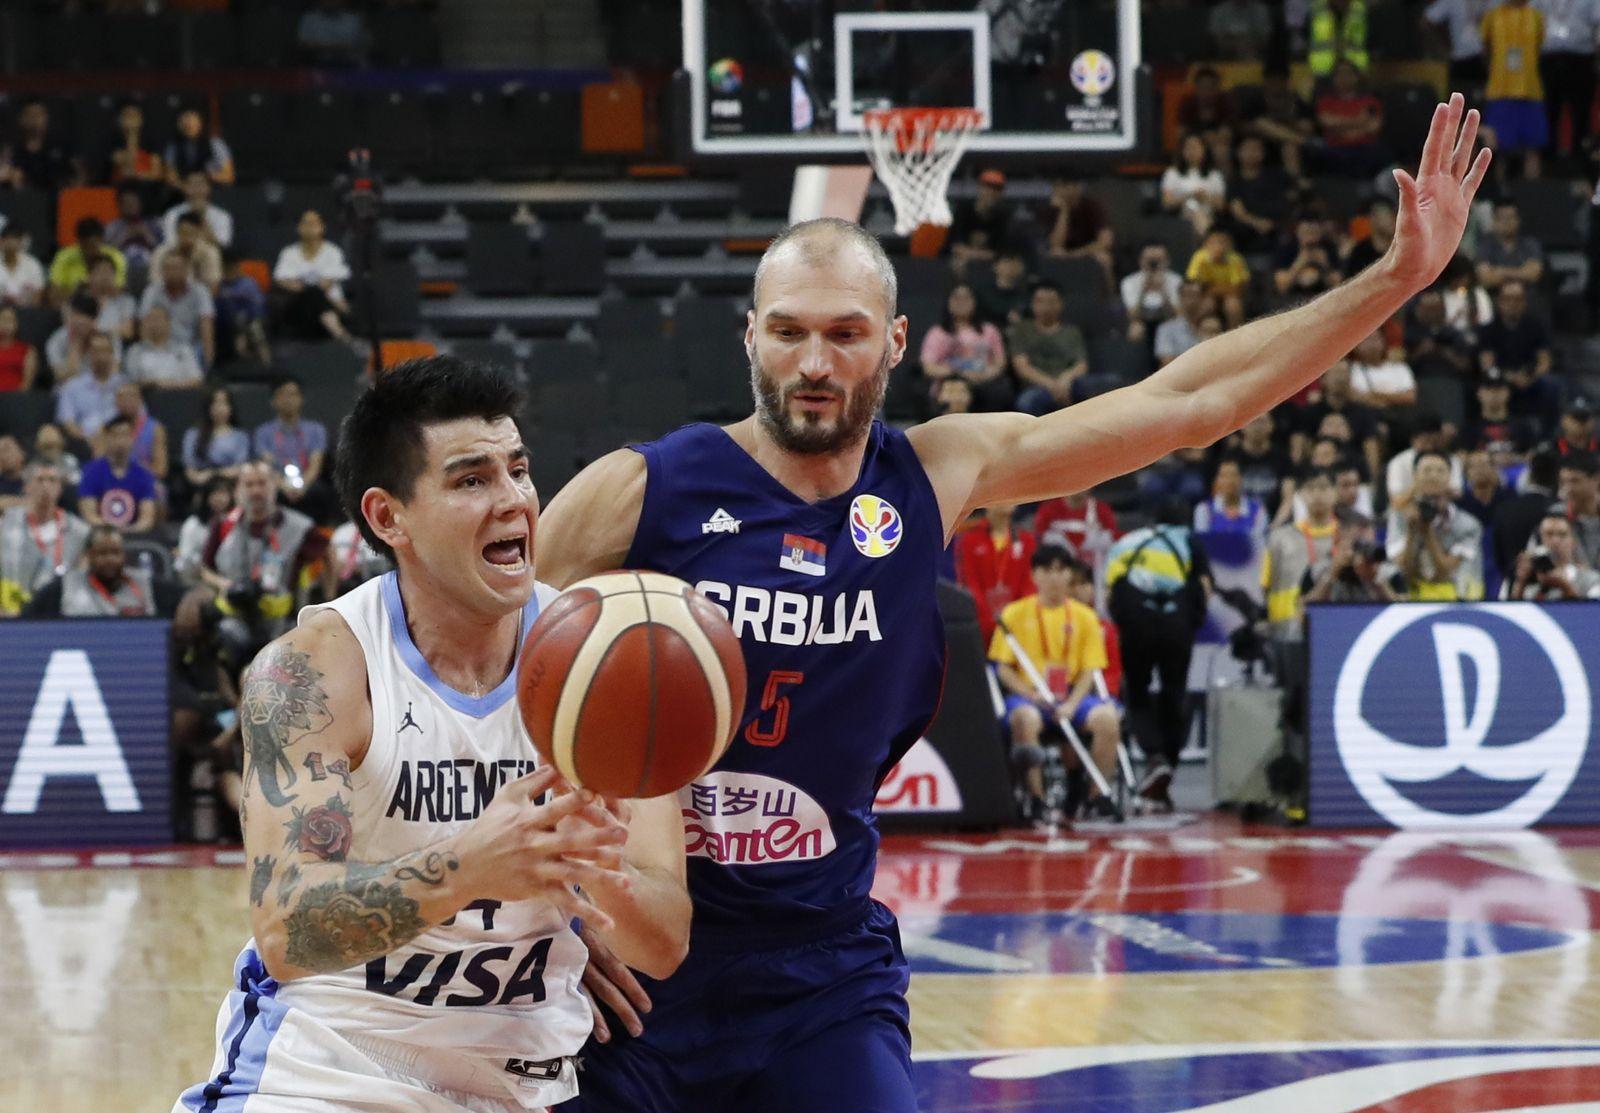 BASKETBALL-WORLDCUP-ARG-SRB/